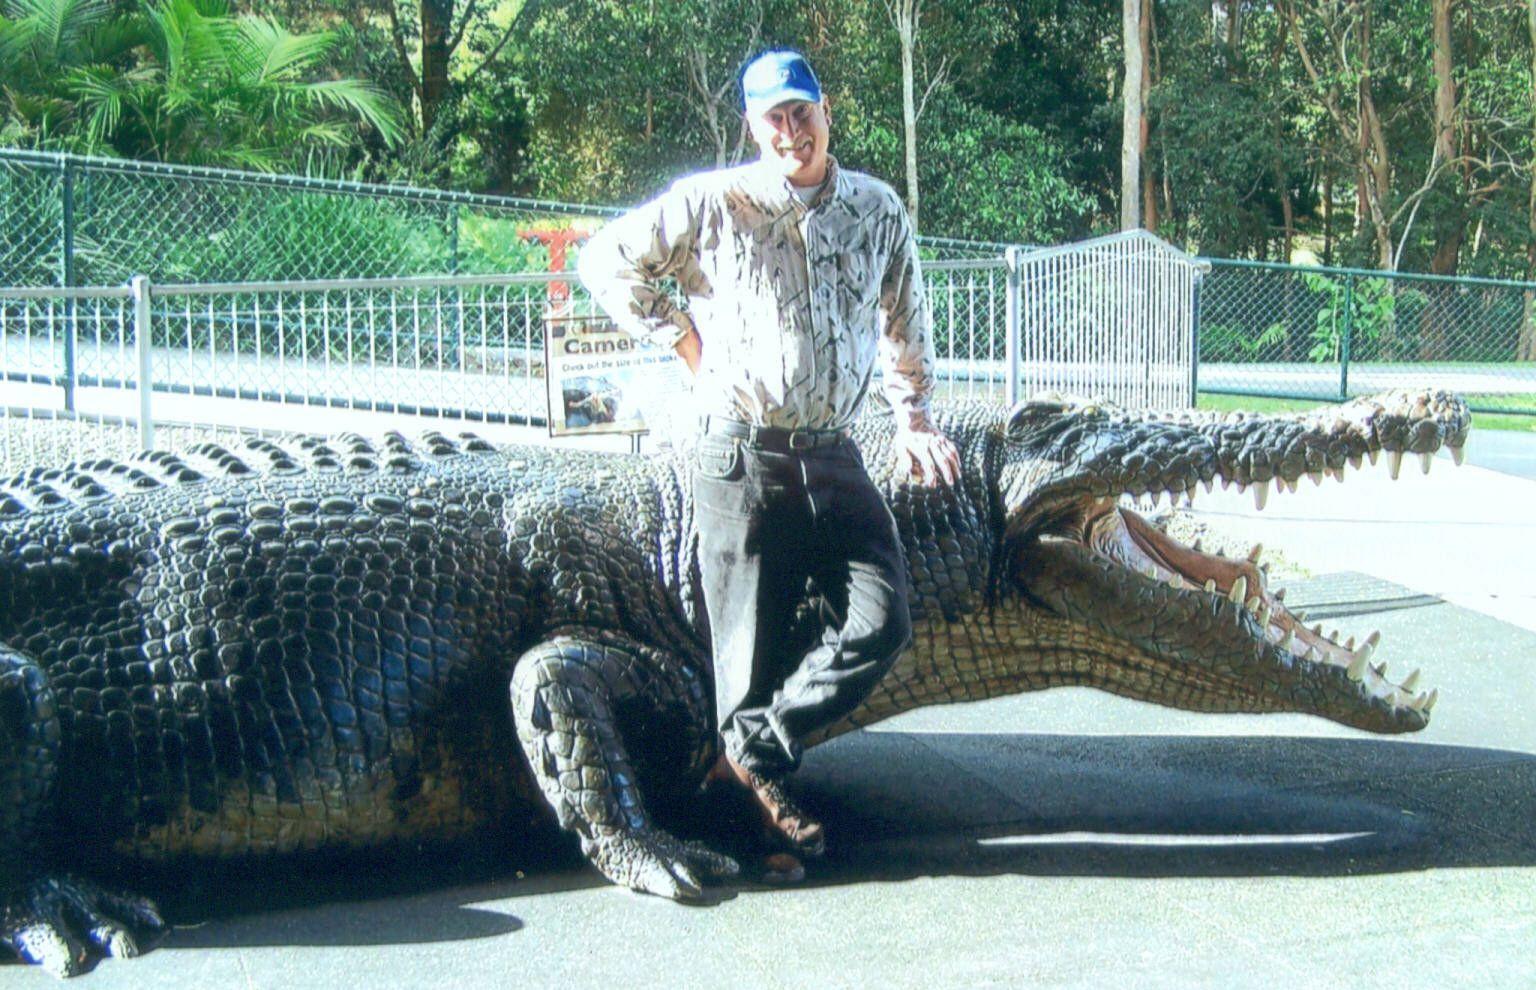 is+crocodile+gustave+alive   Gustave Crocodile   Animal ...